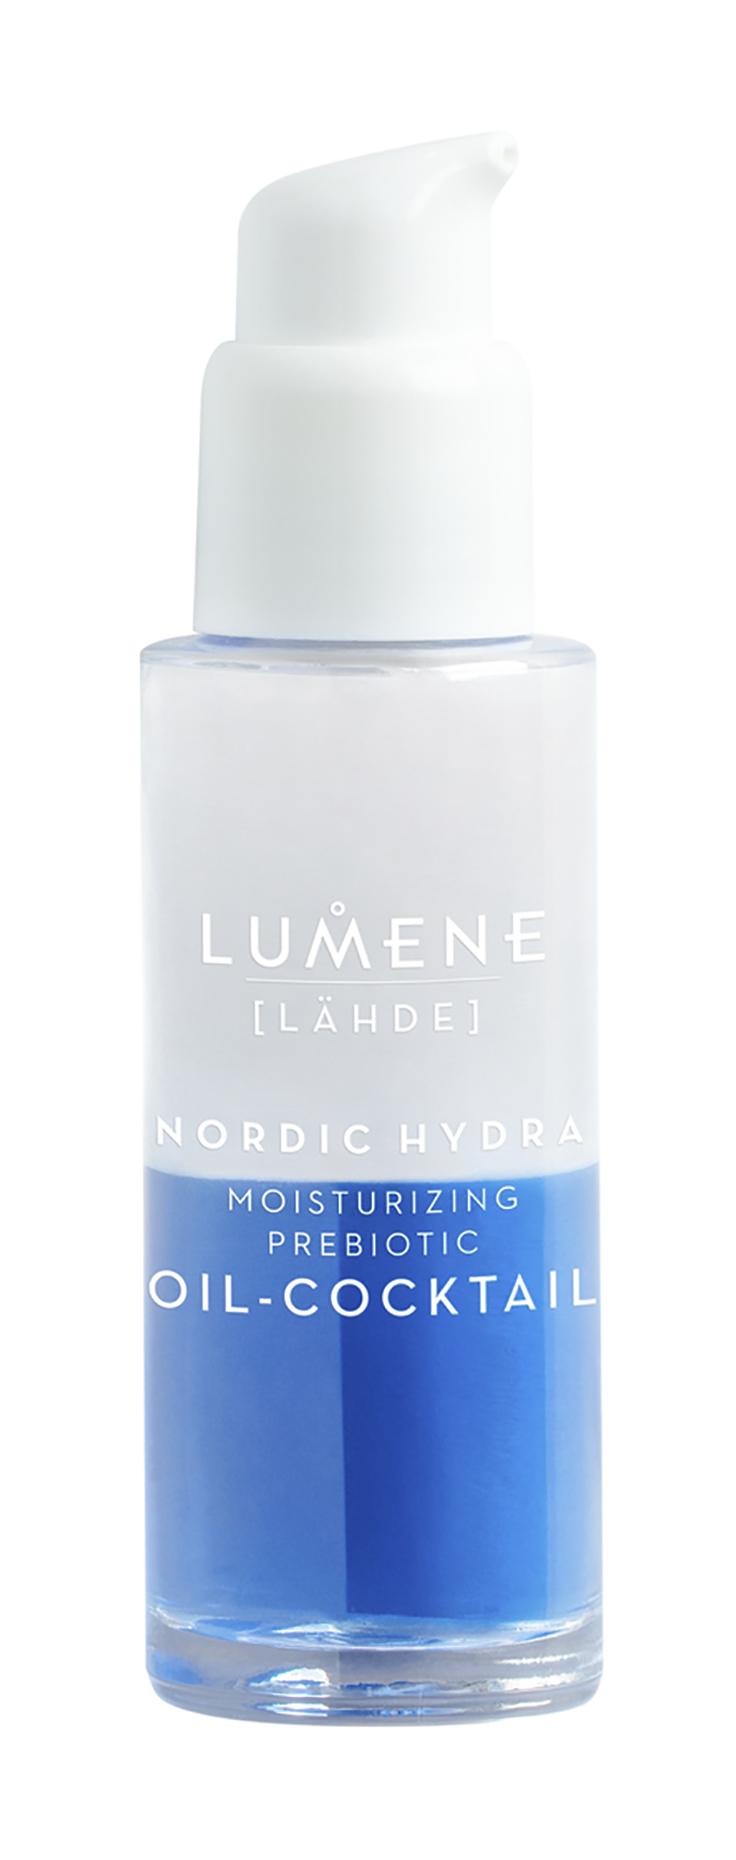 Увлажняющая сыворотка Lumene Nordic Hydra Moisturizing Prebiotic